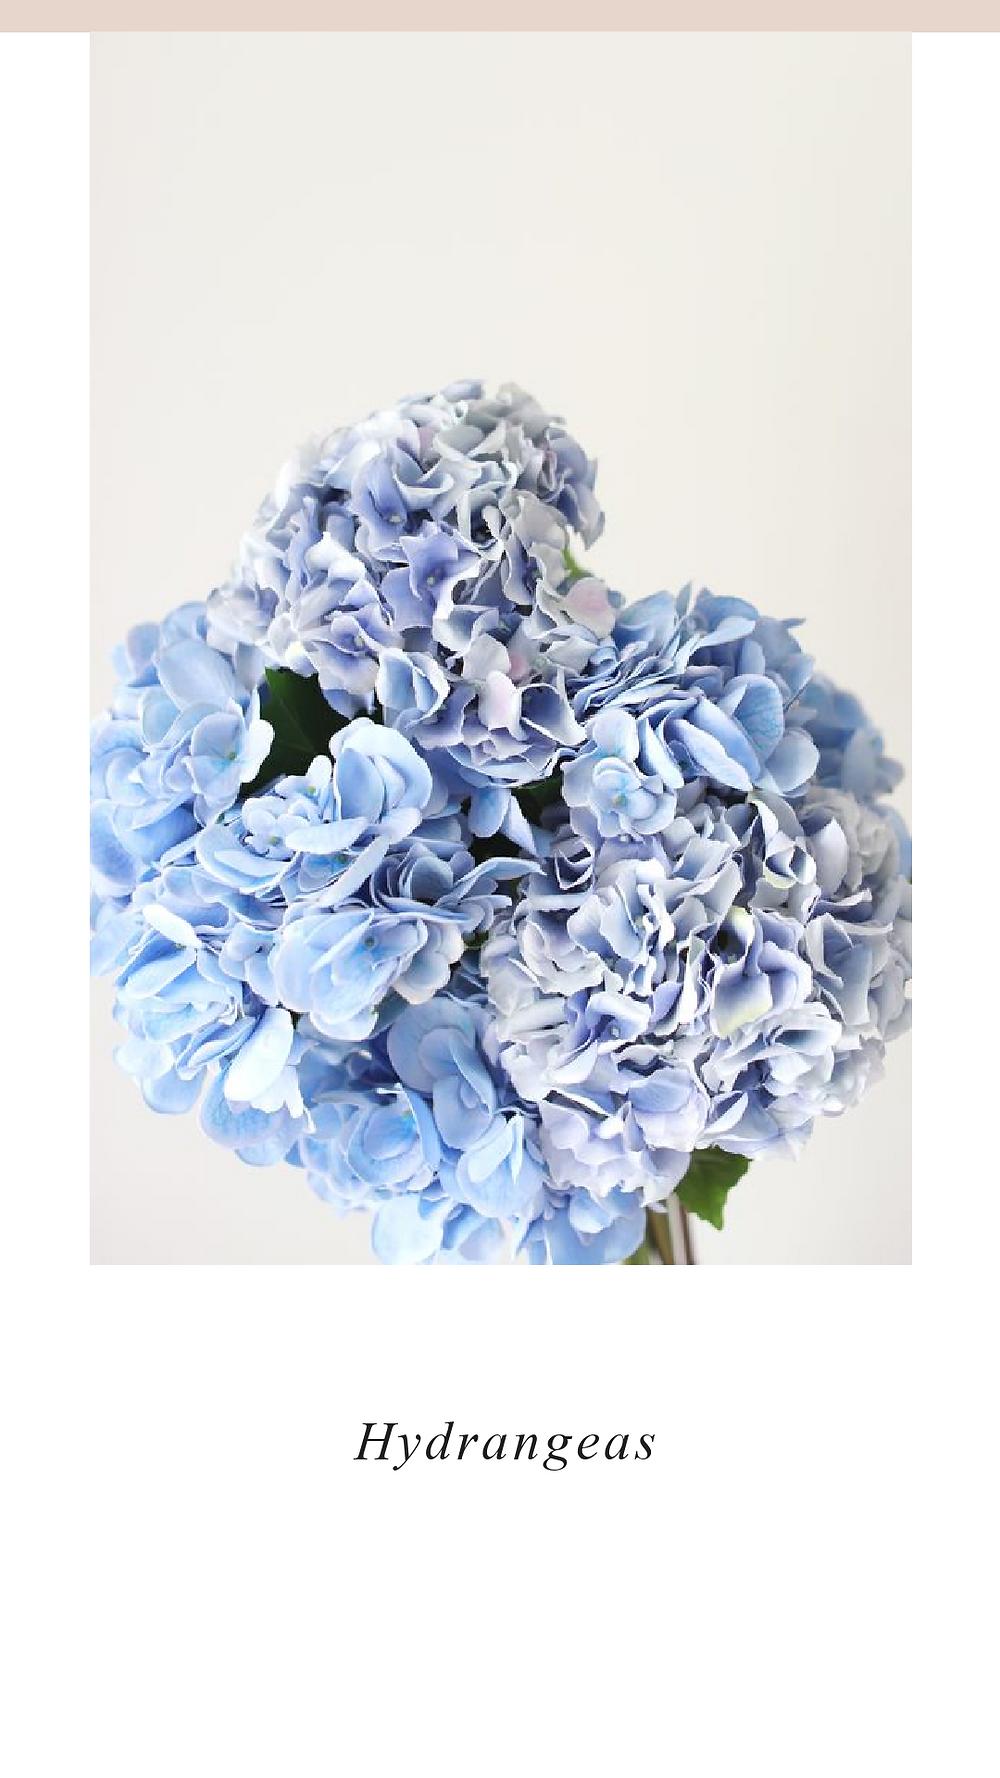 Hydrangeas, Valentines Day Flowers